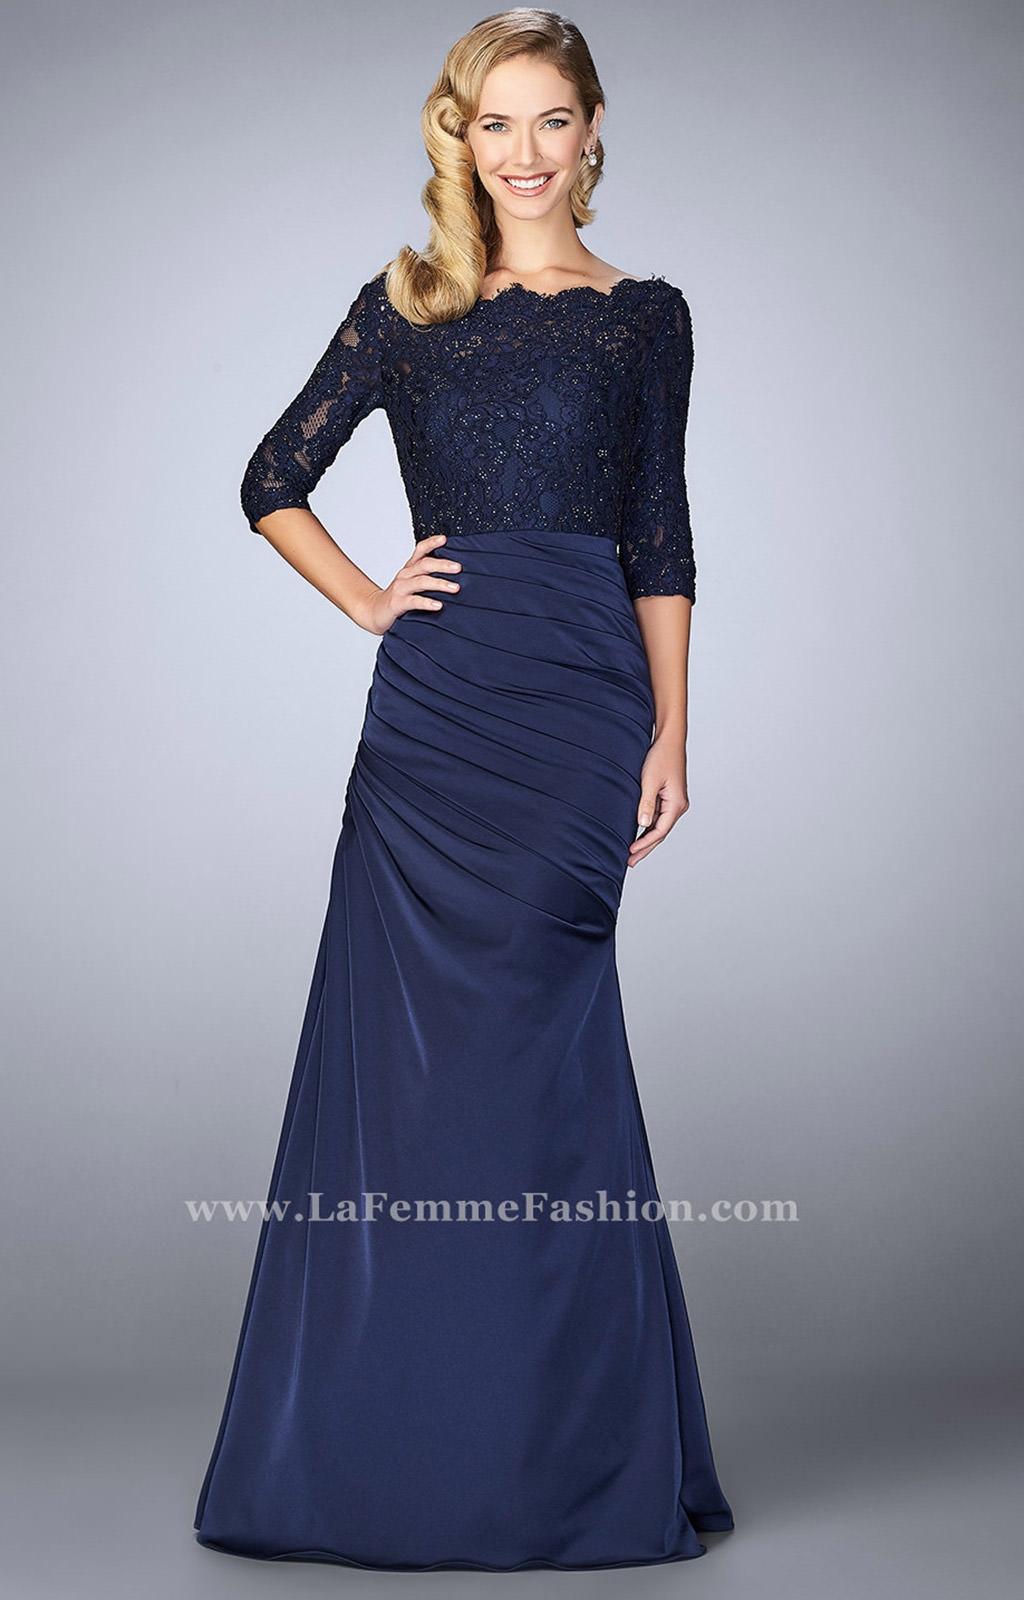 La Femme 24926 - Long Sleeve Prom Dress